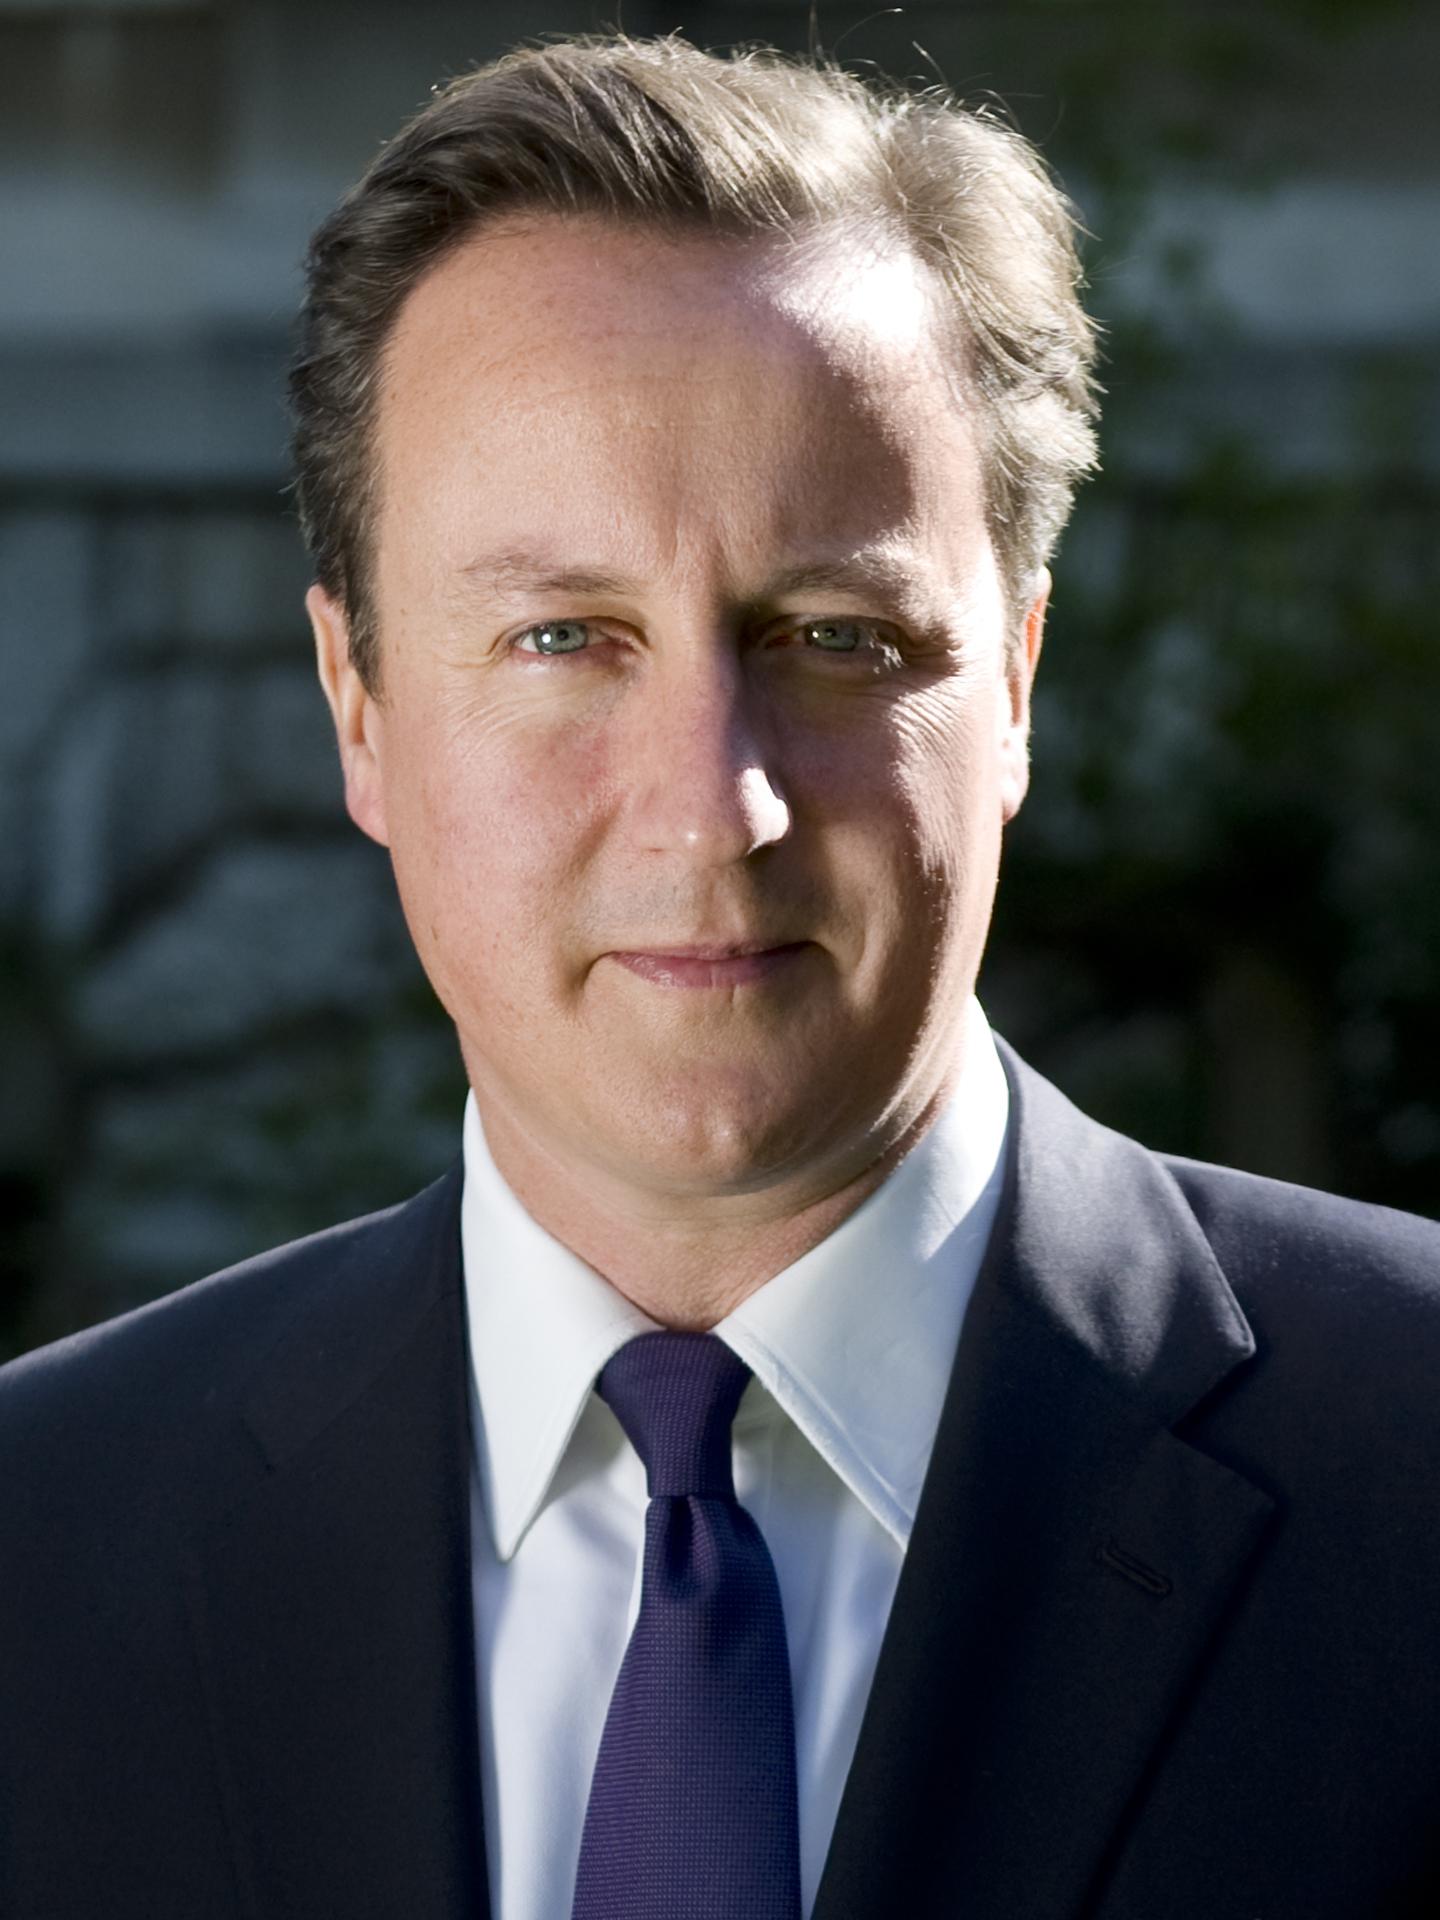 File:David Cameron official.jpg